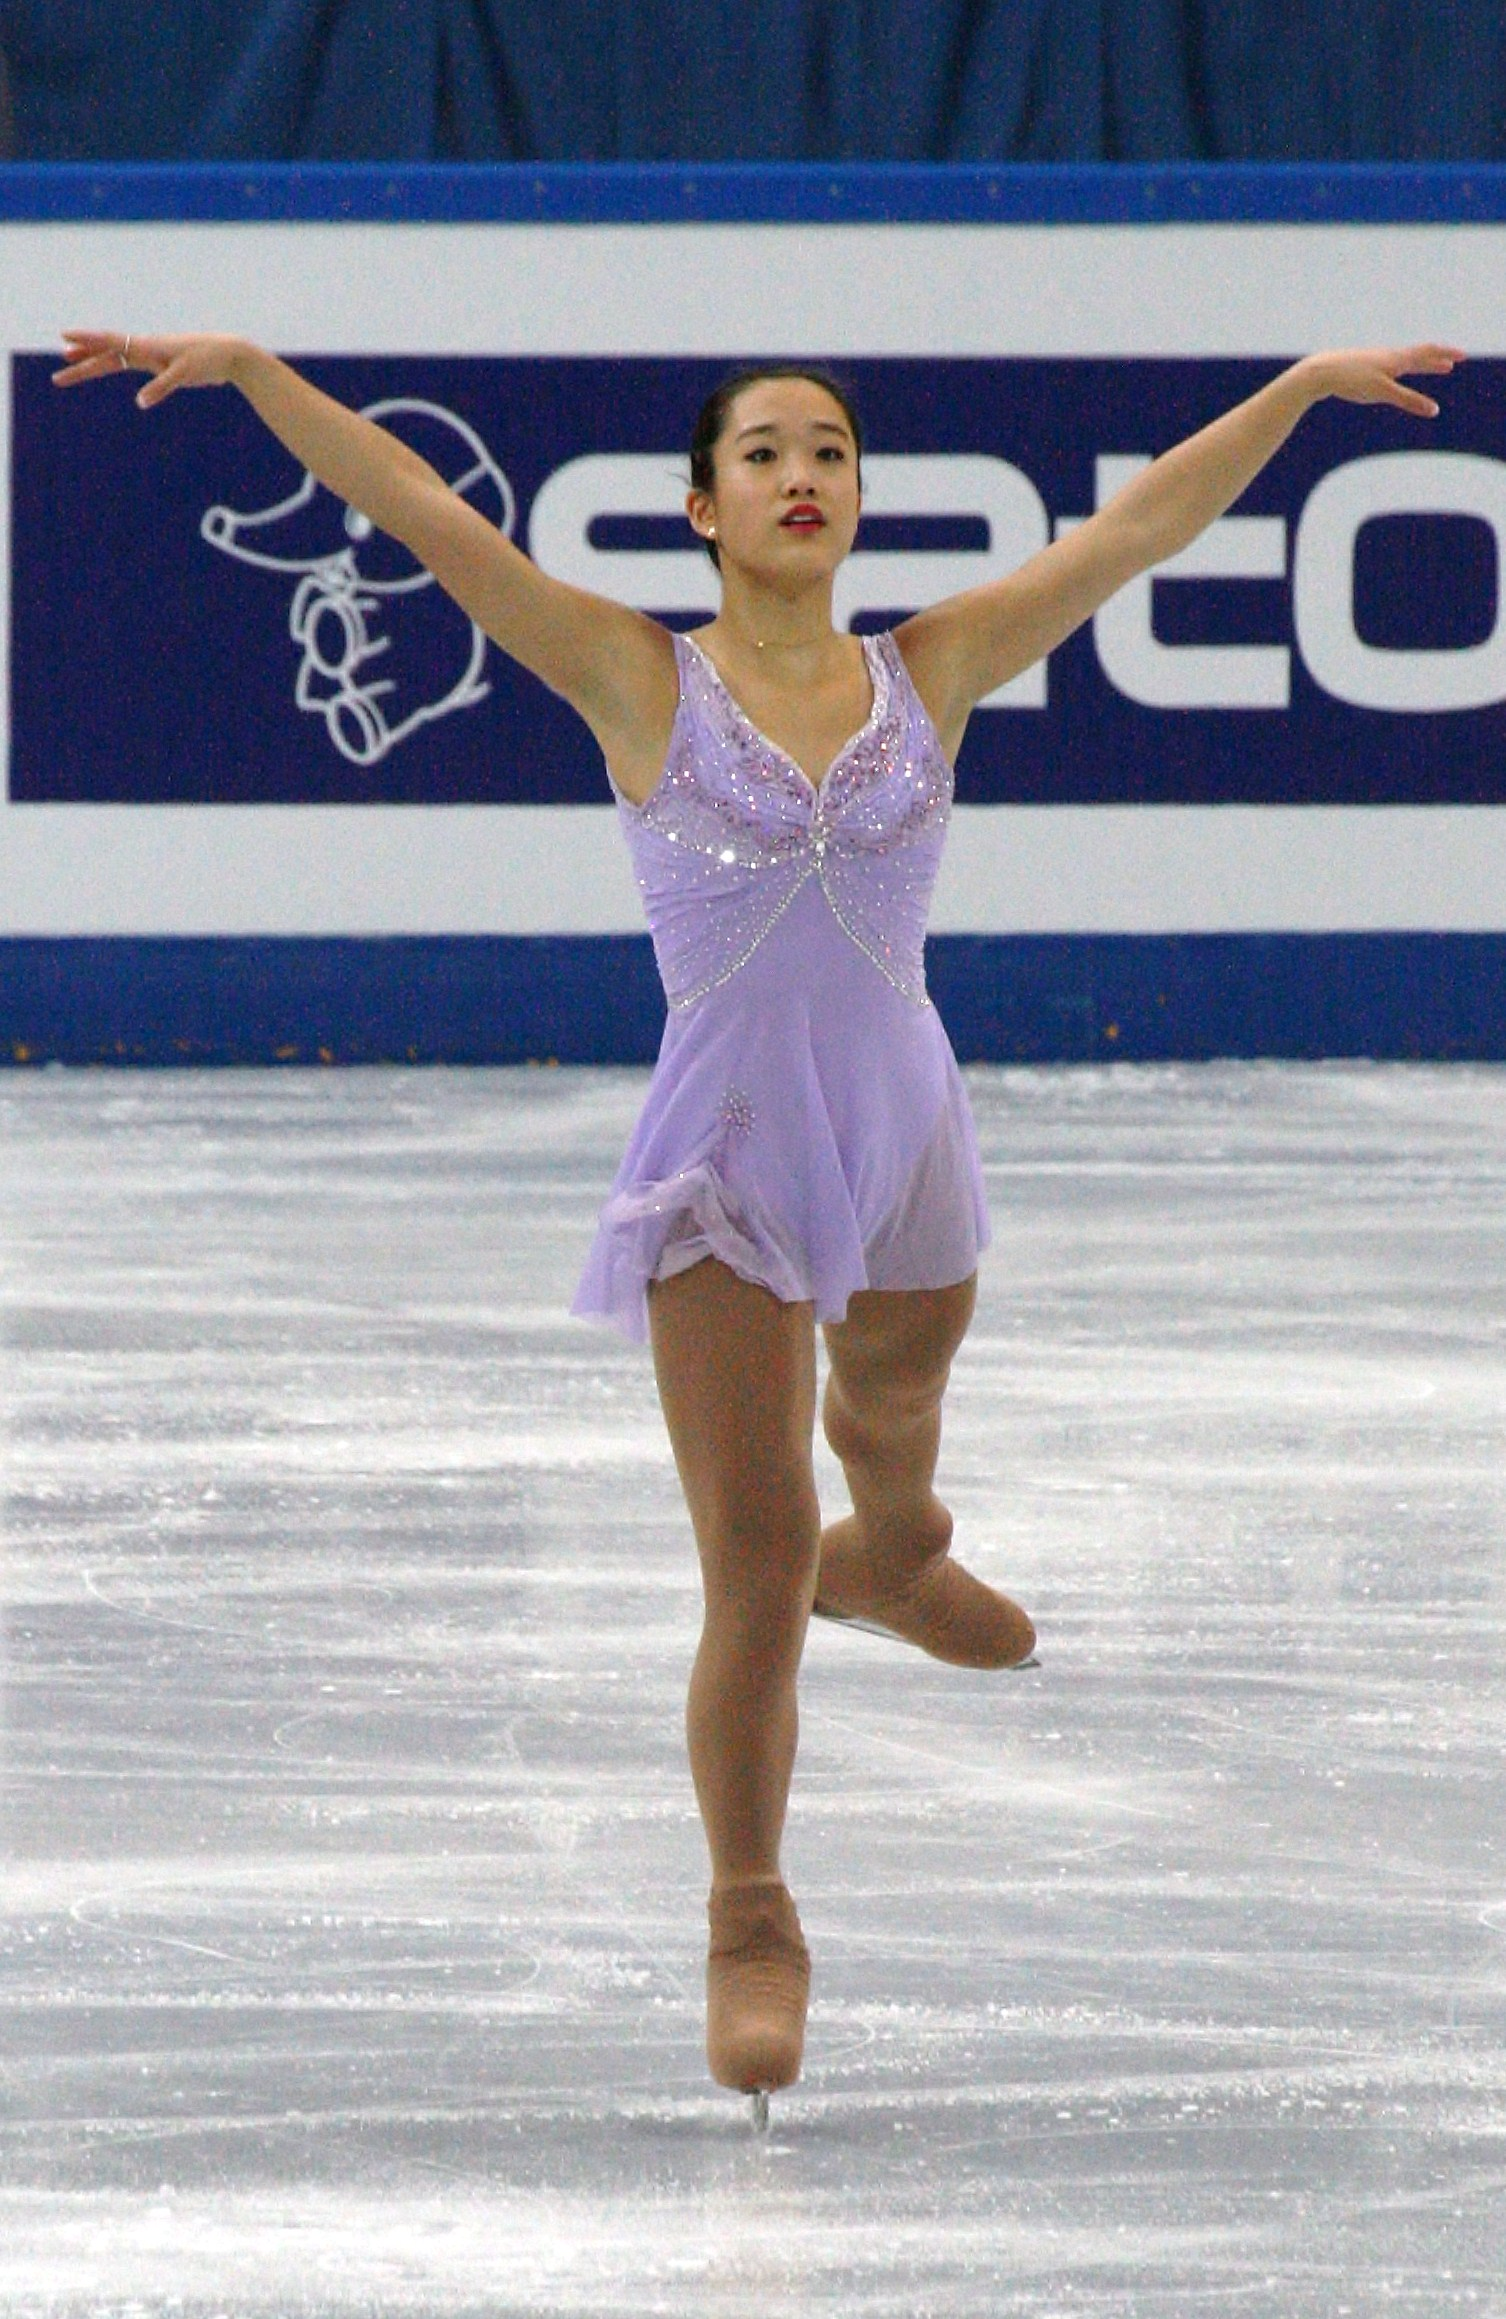 100 Images of Angela Wang